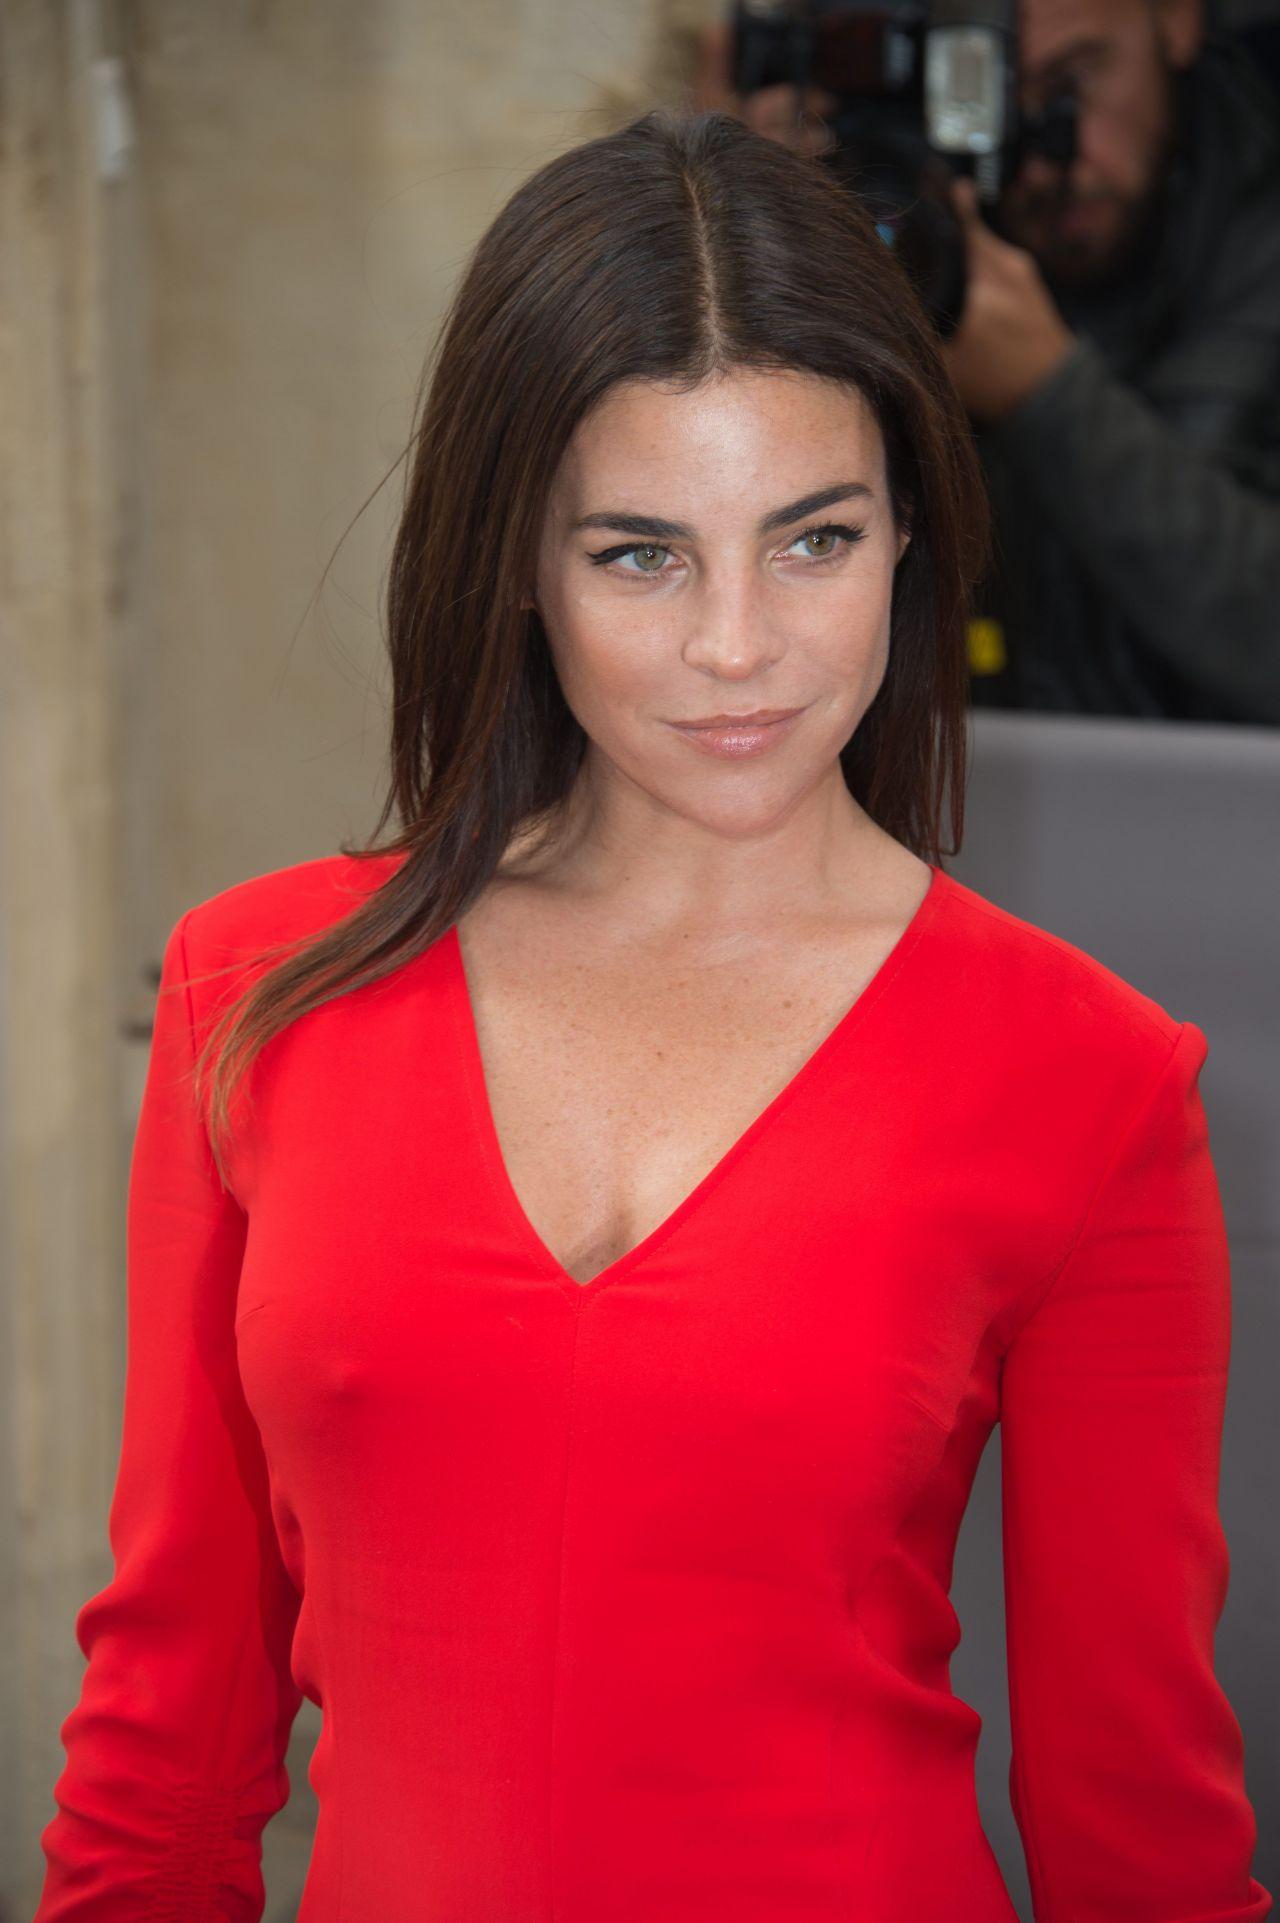 Francine Lapensee